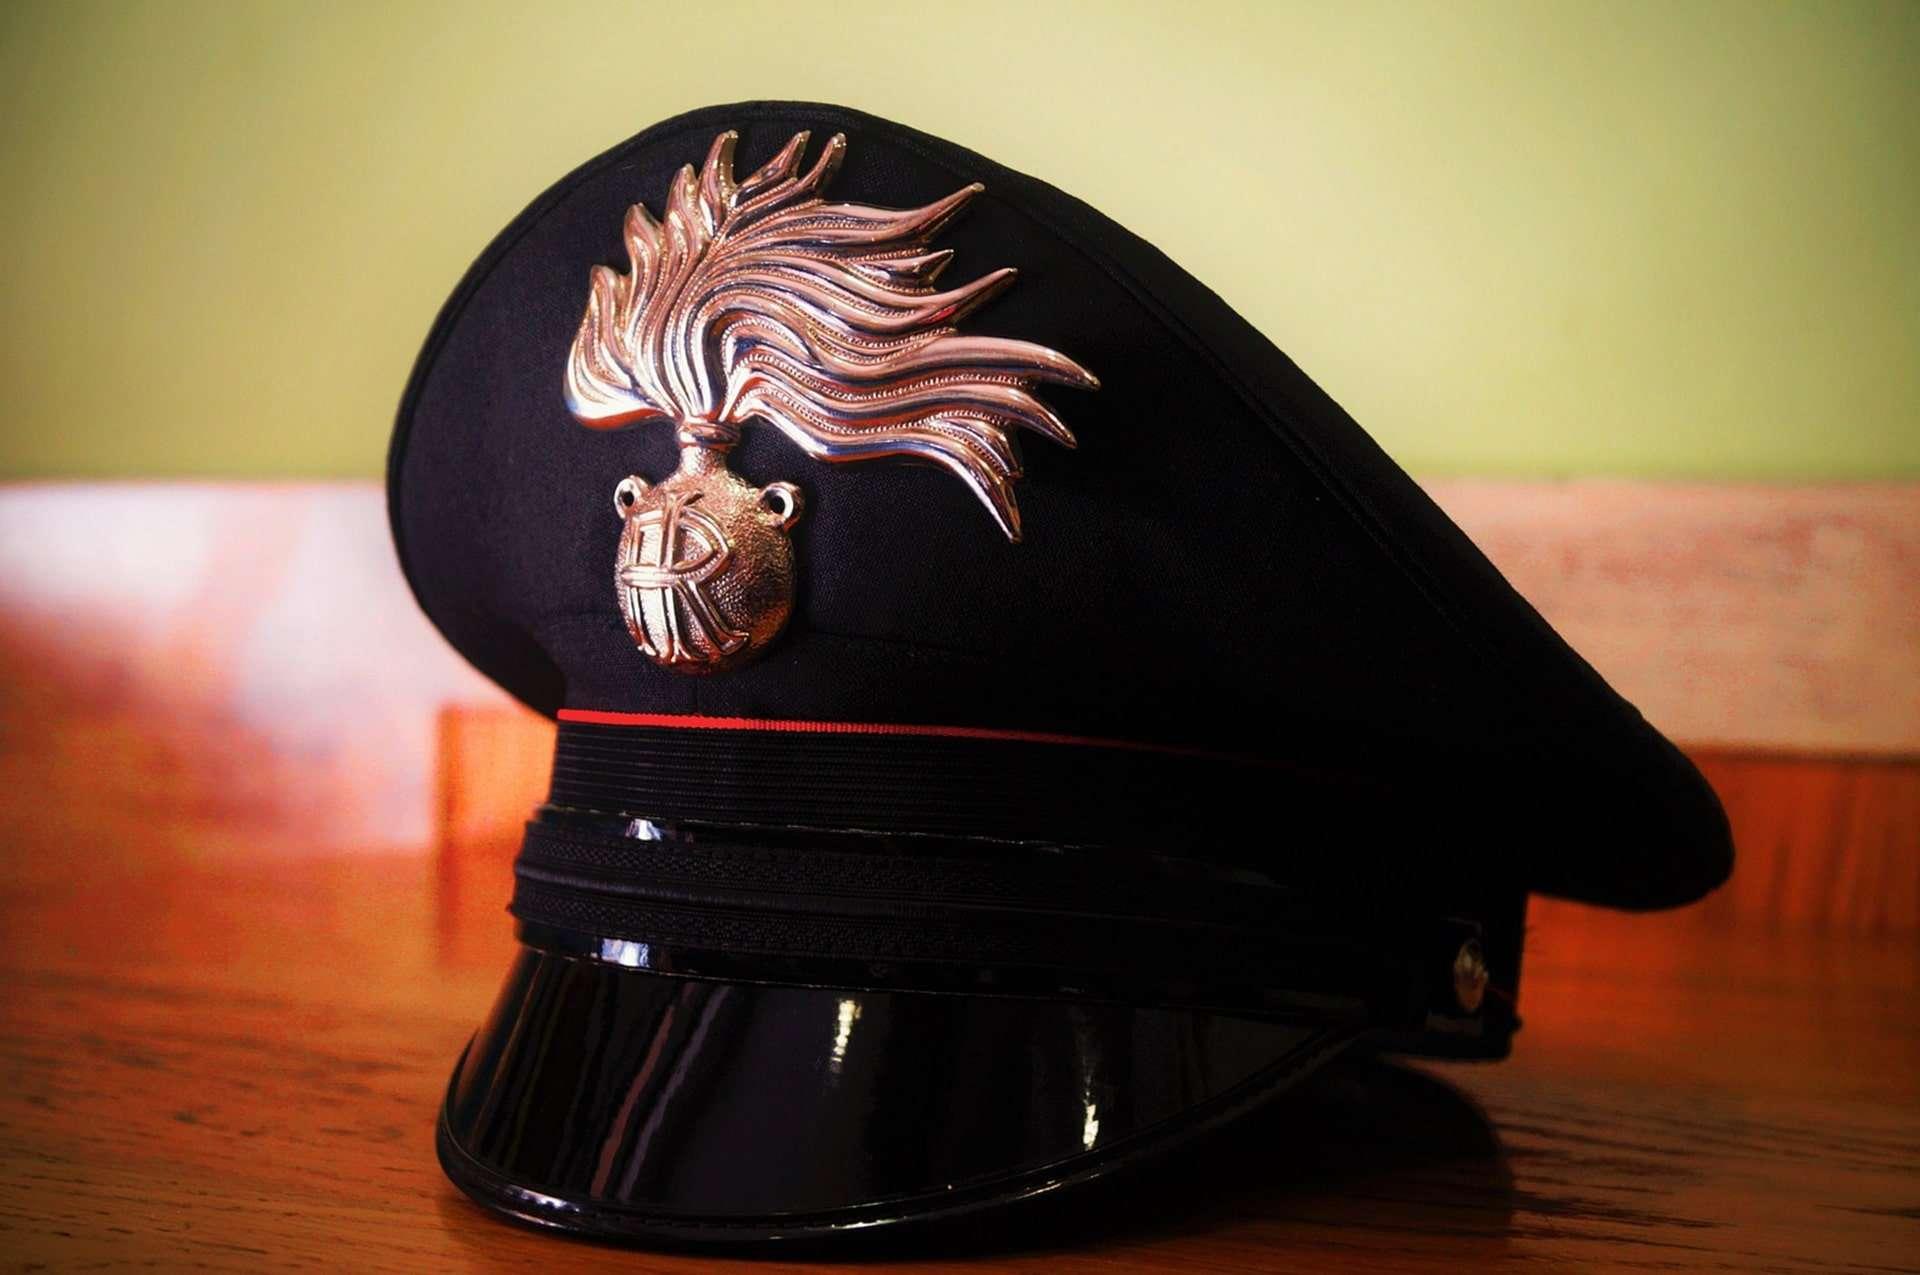 terminillo carabinieri